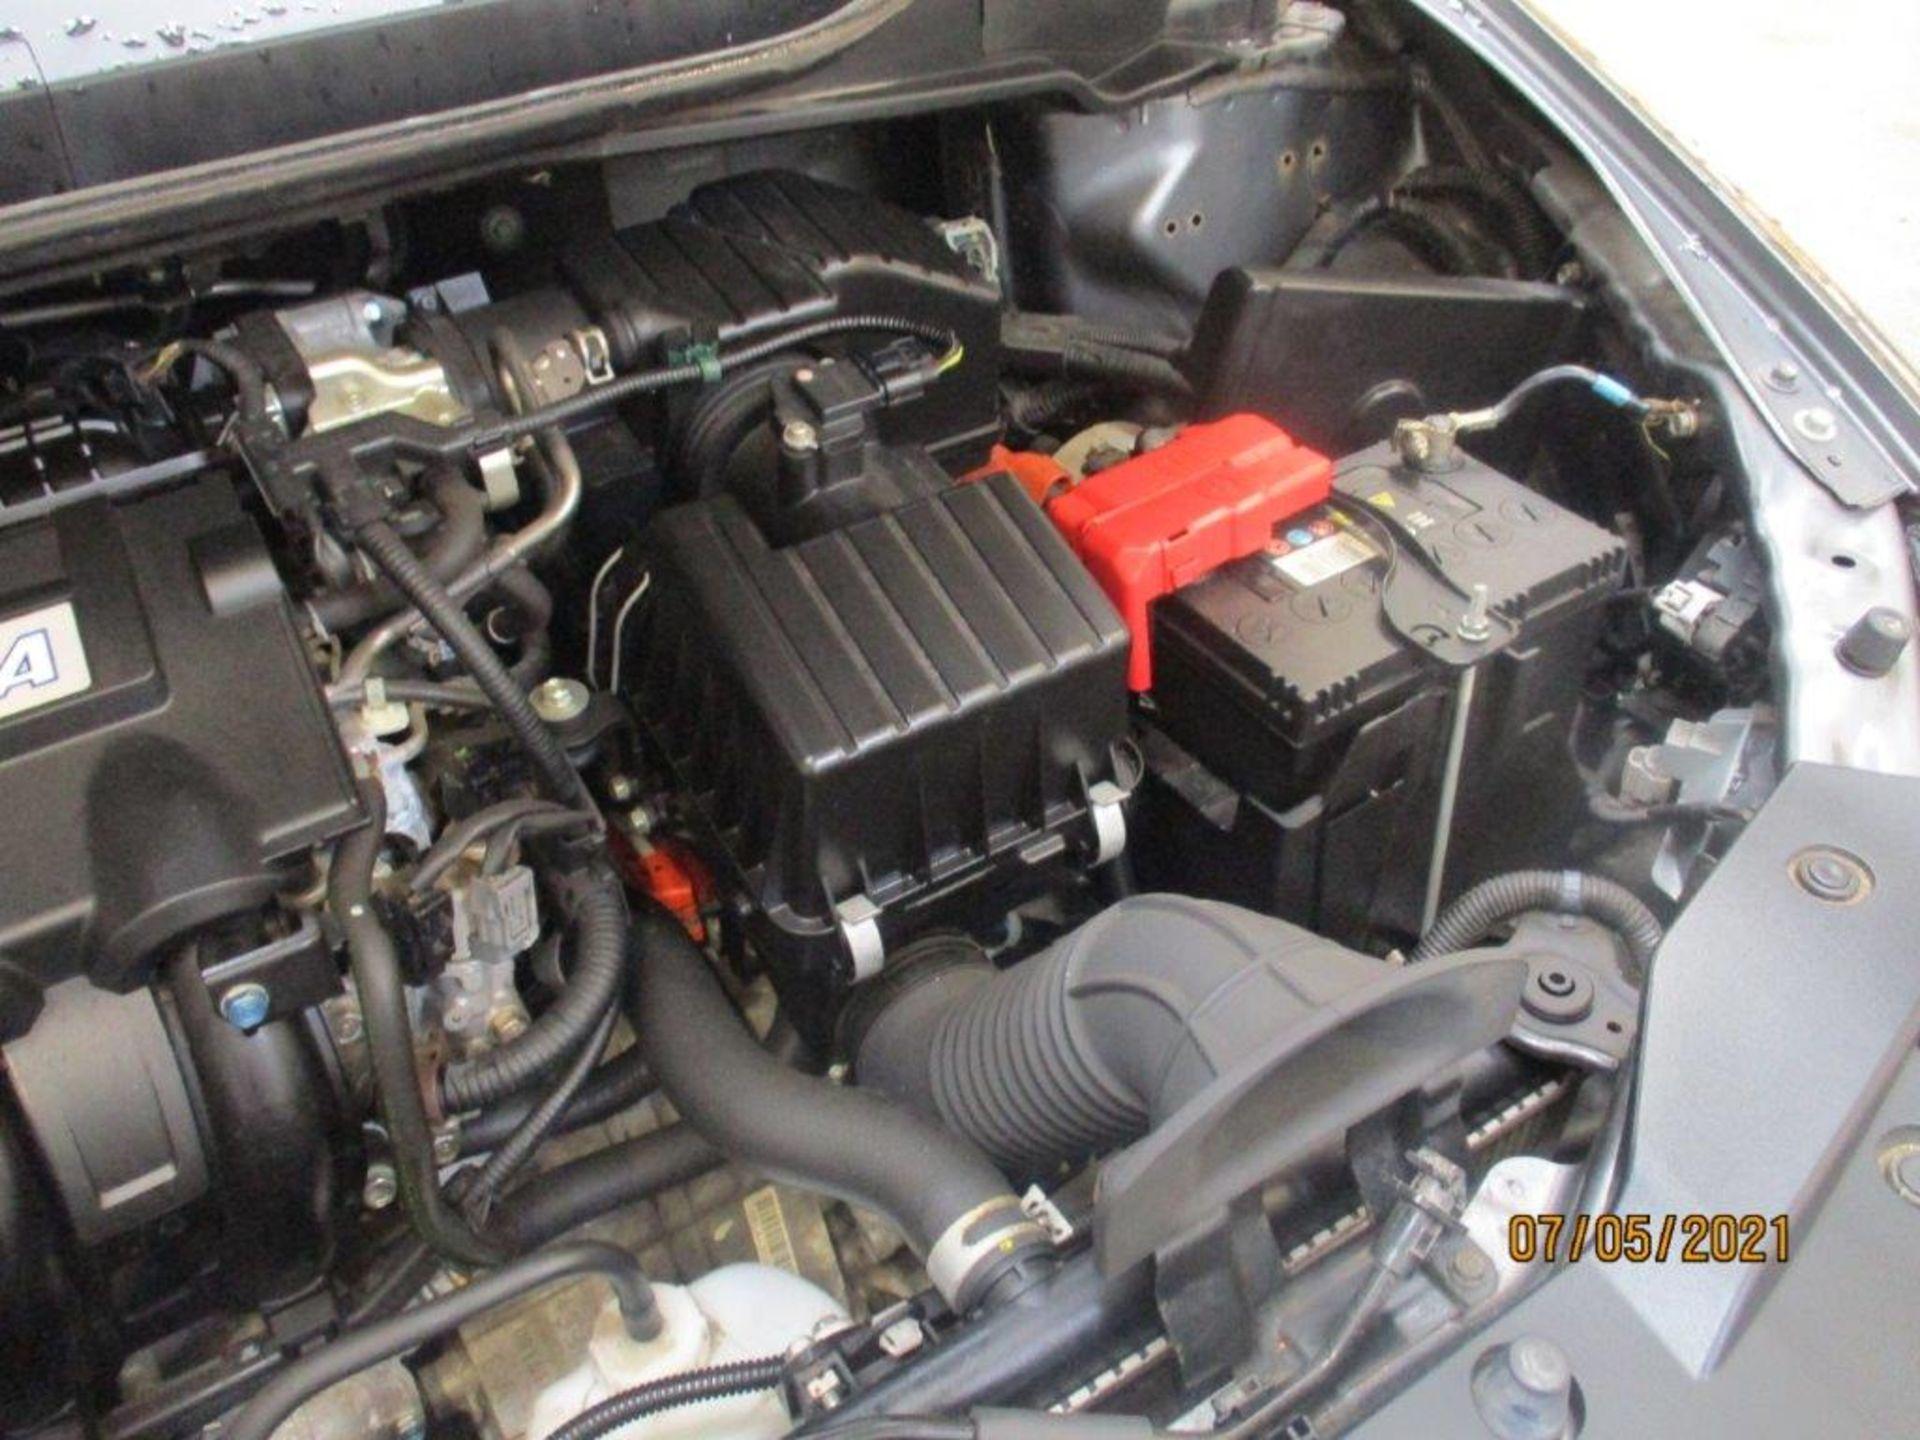 11 11 Honda Insight ES CVT - Image 5 of 21